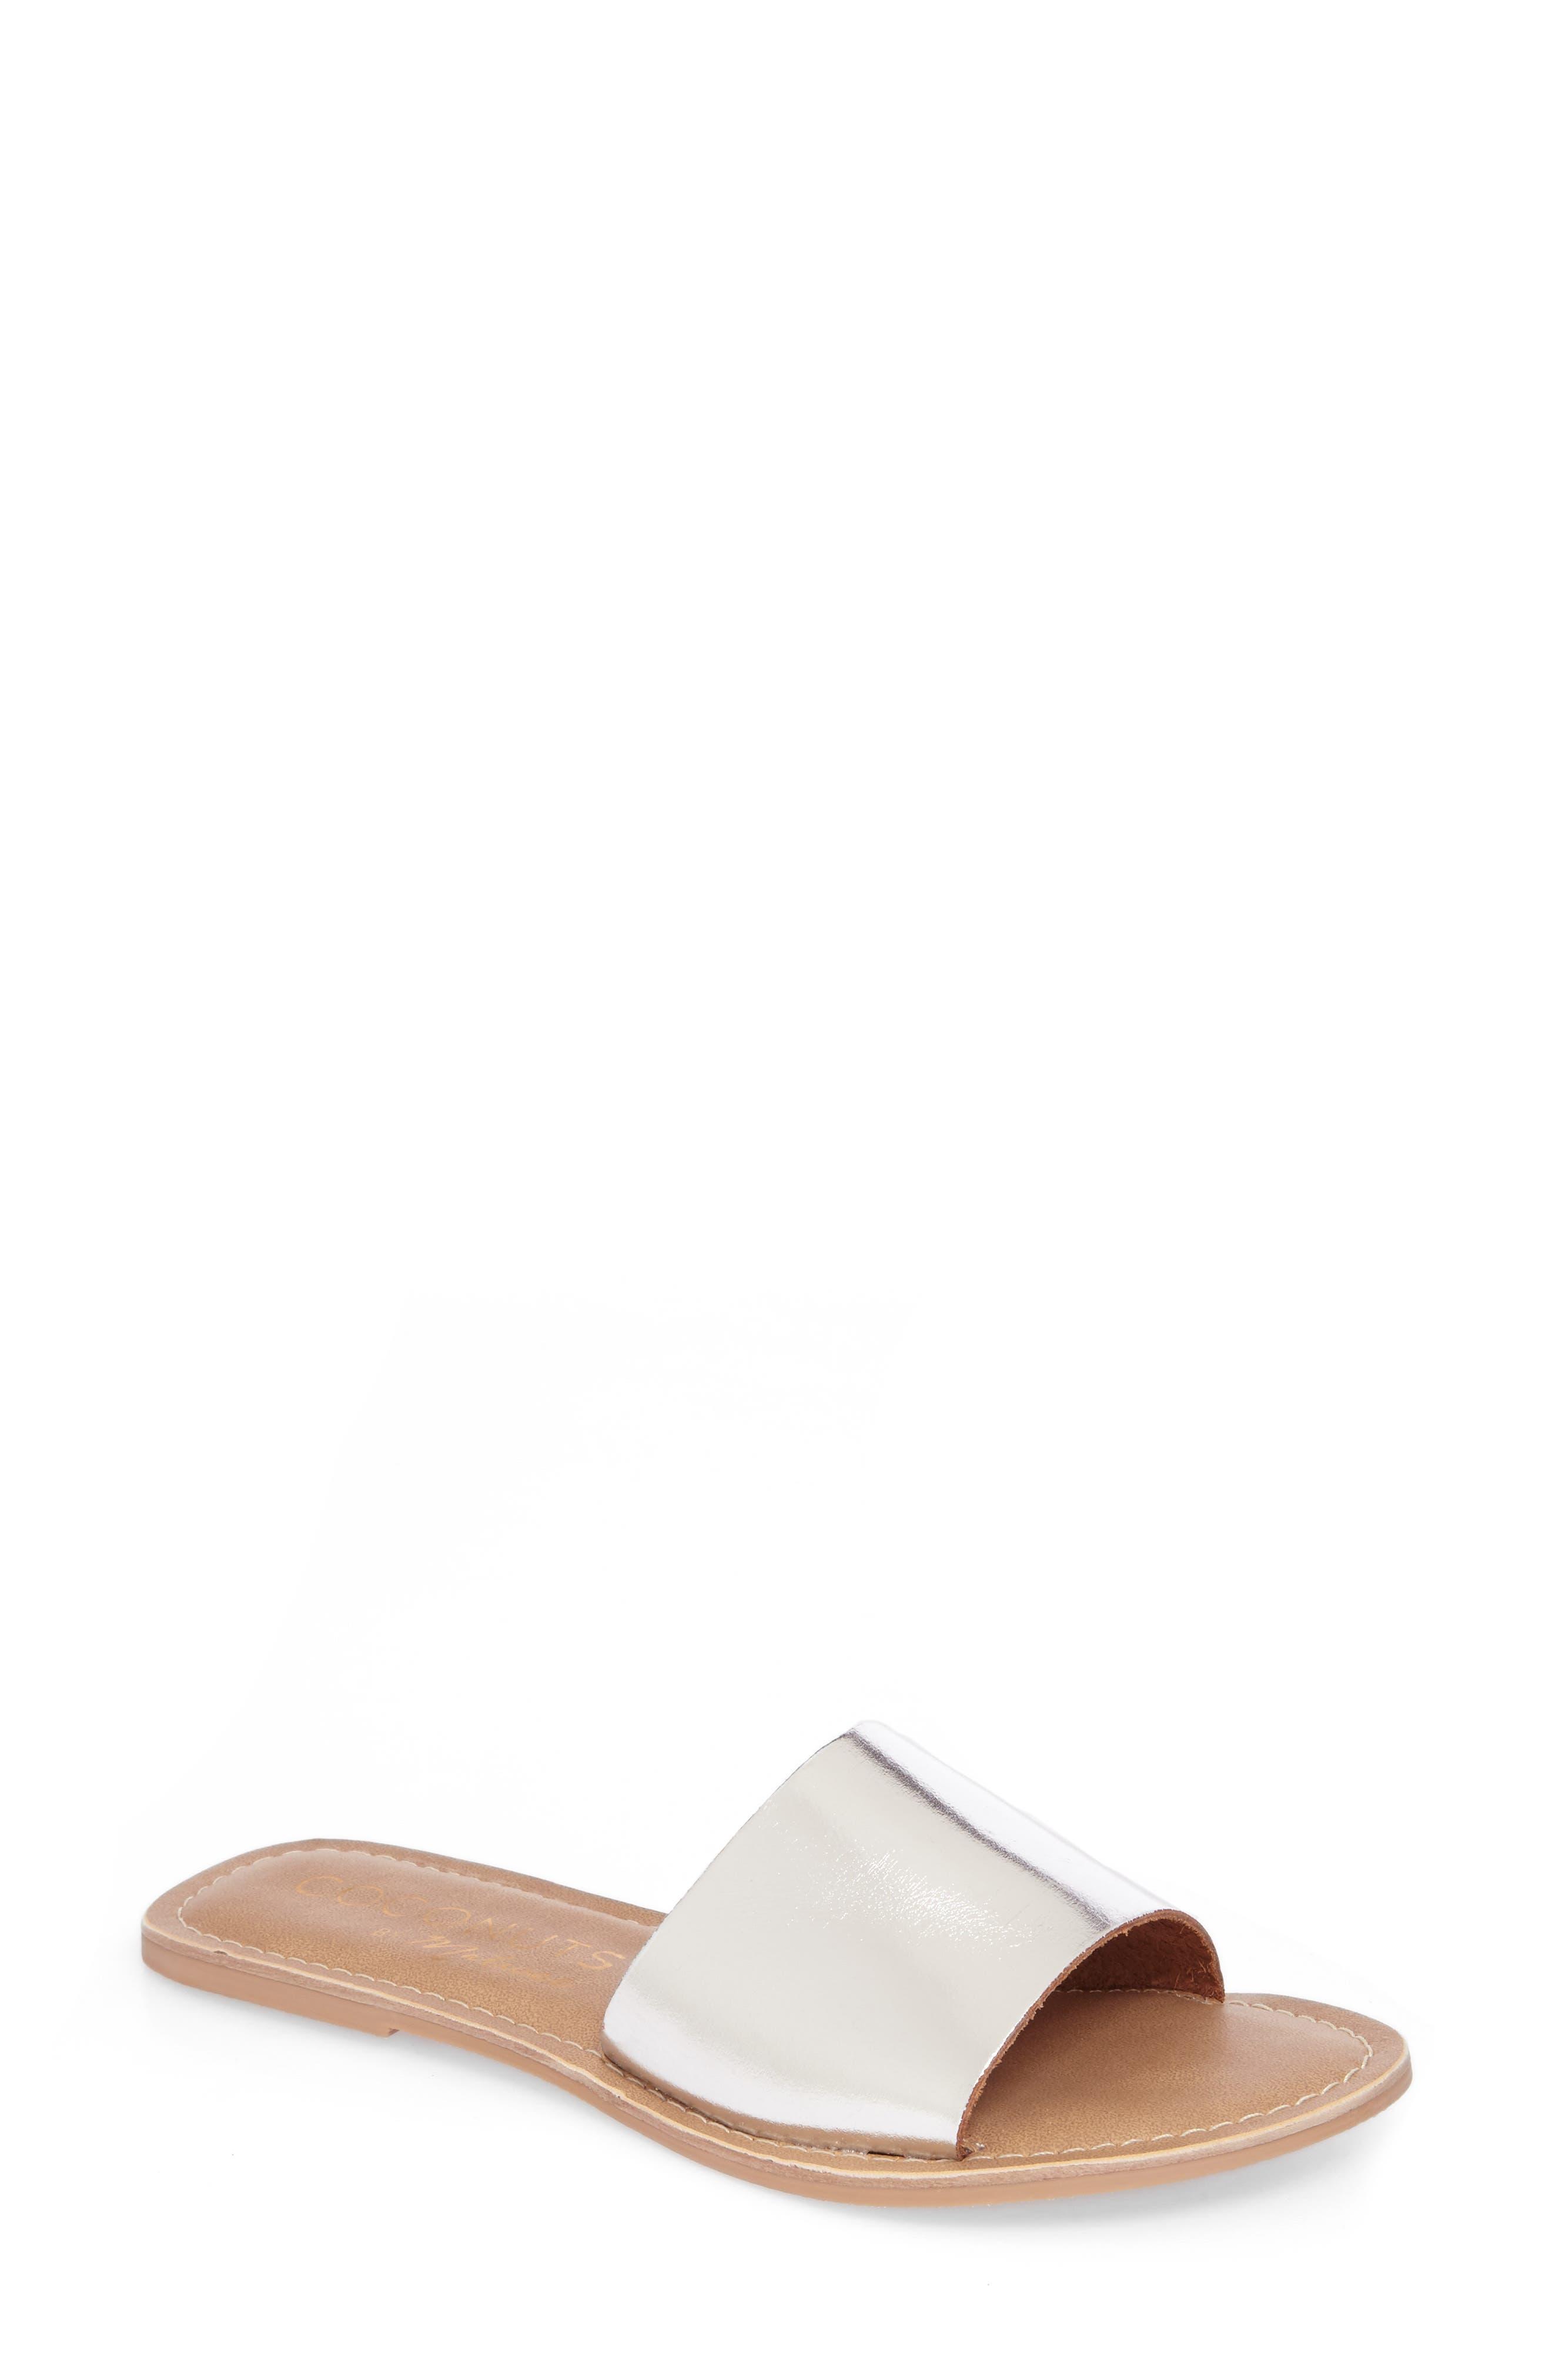 Alternate Image 1 Selected - Coconuts by Matisse Cabana Slide Sandal (Women)